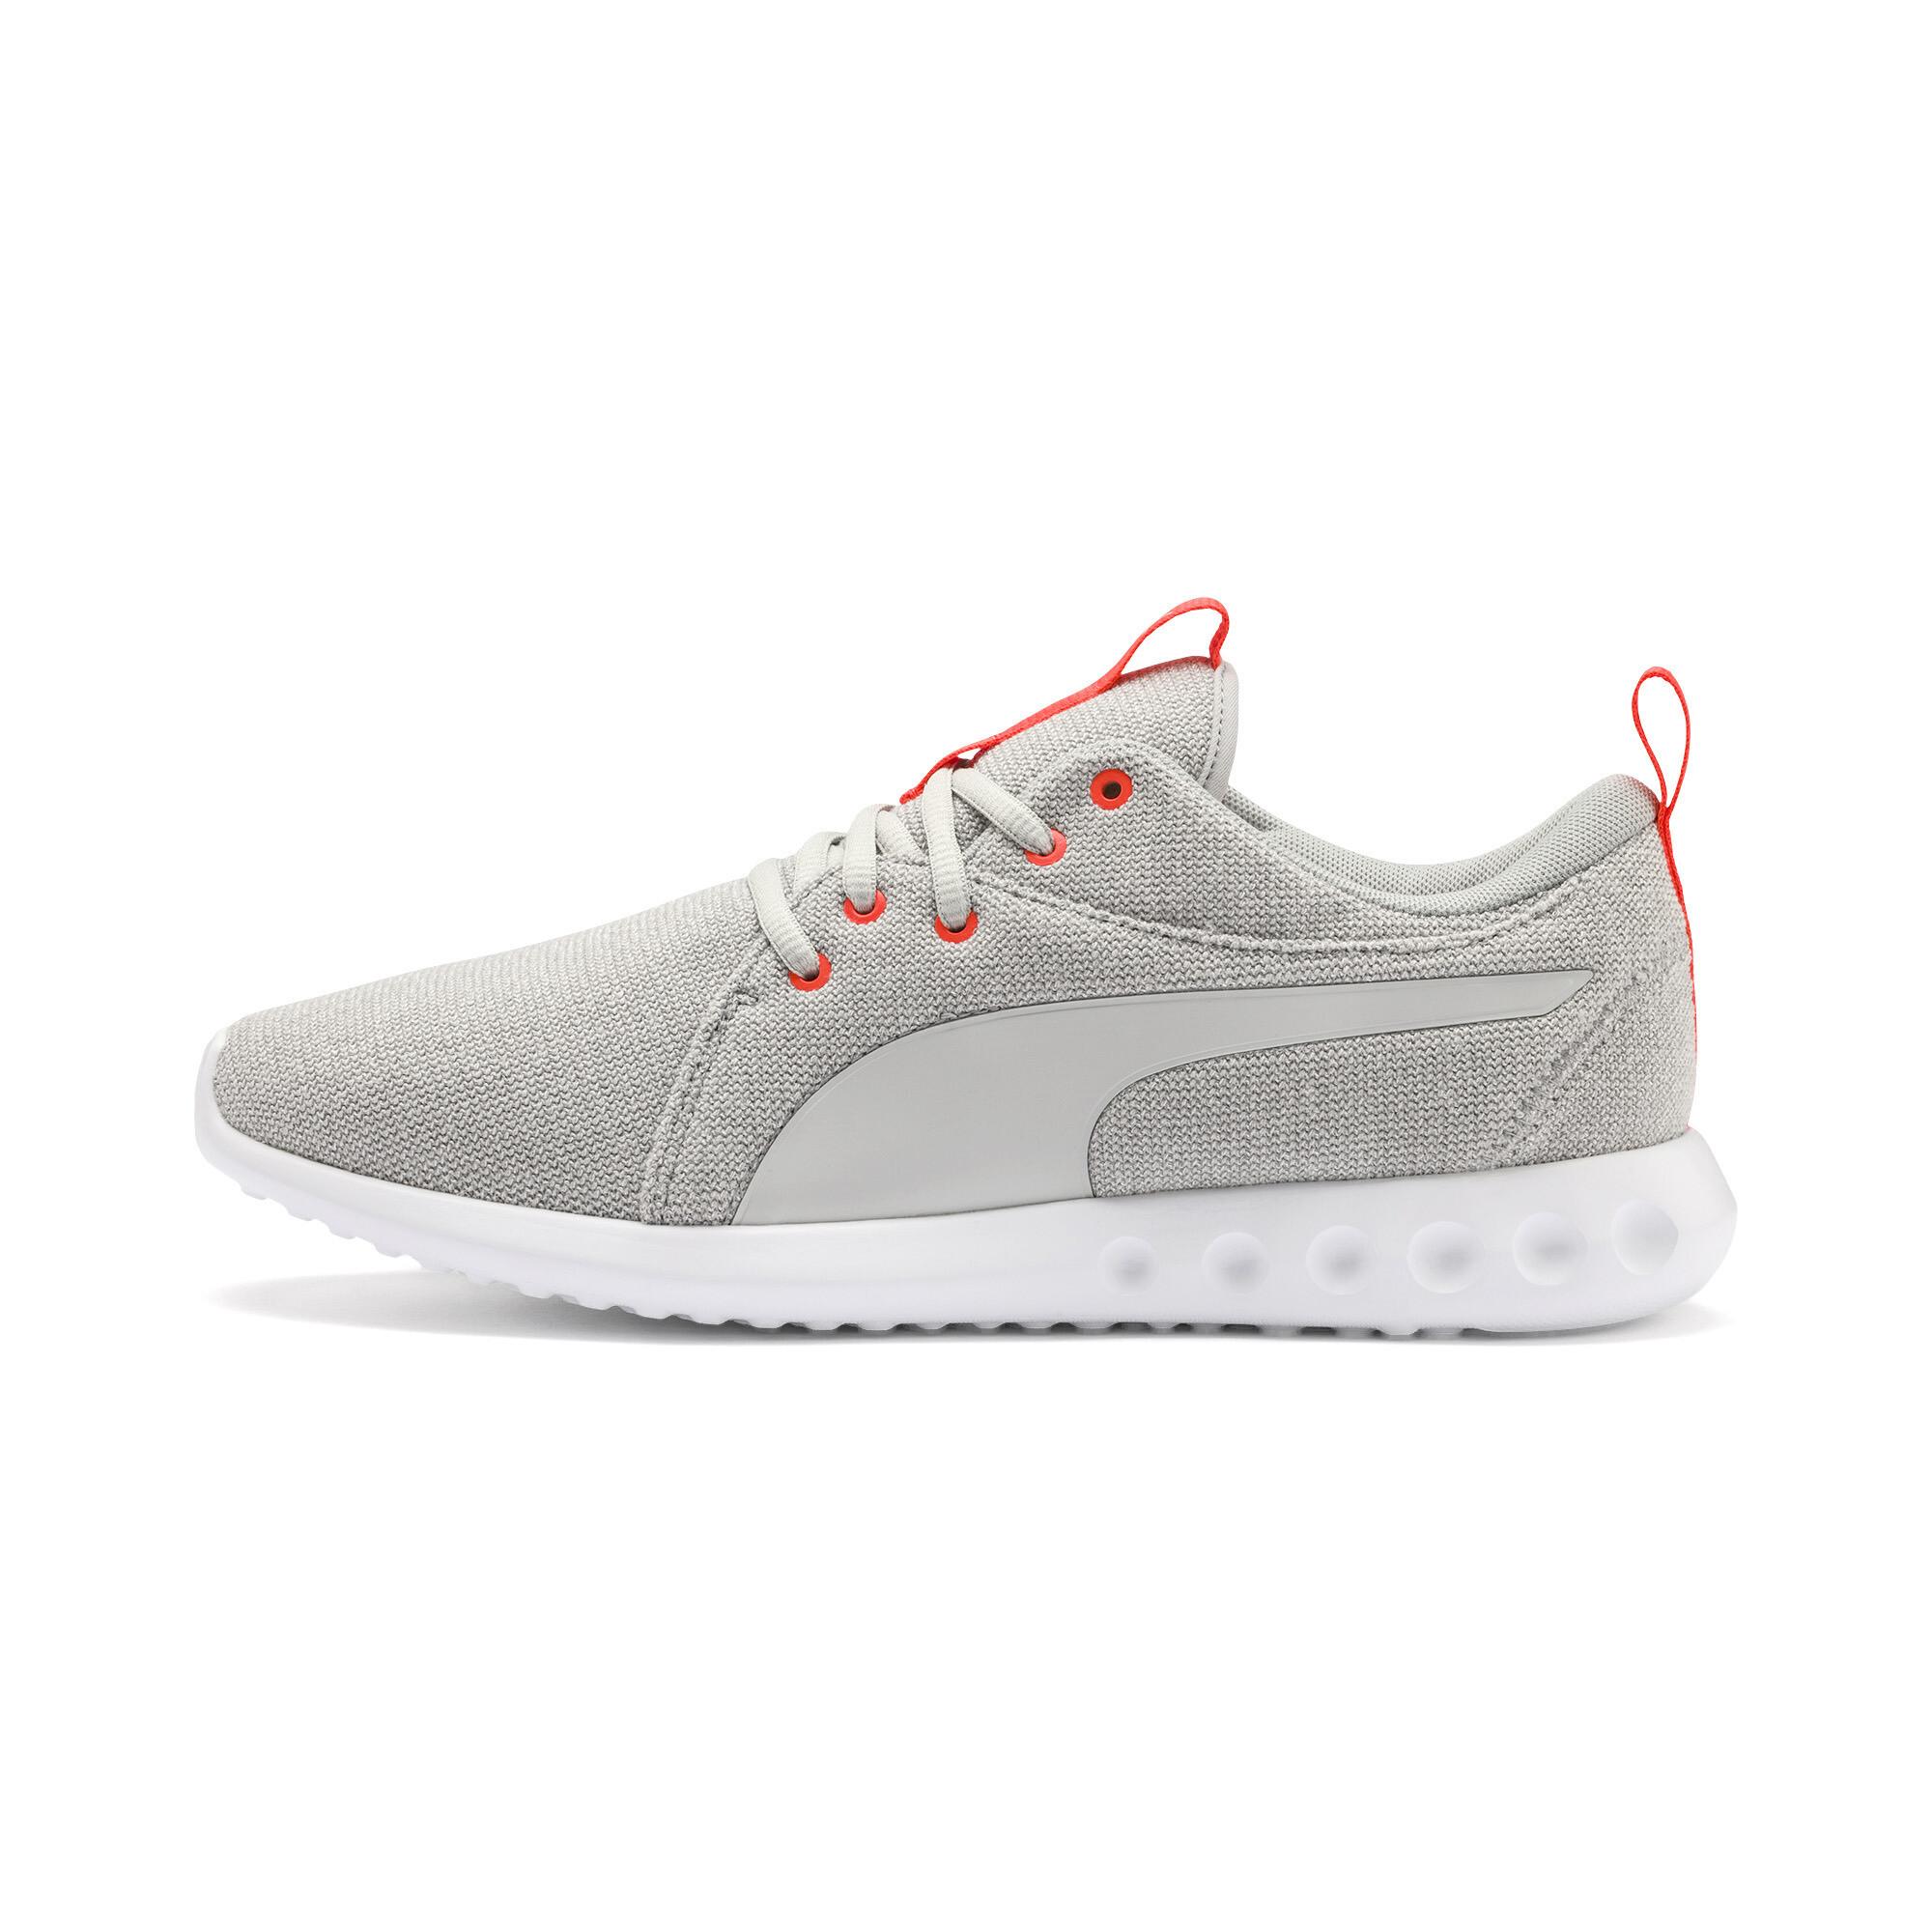 PUMA-Carson-2-Knit-Men-039-s-Training-Shoes-Men-Shoe-Running thumbnail 12